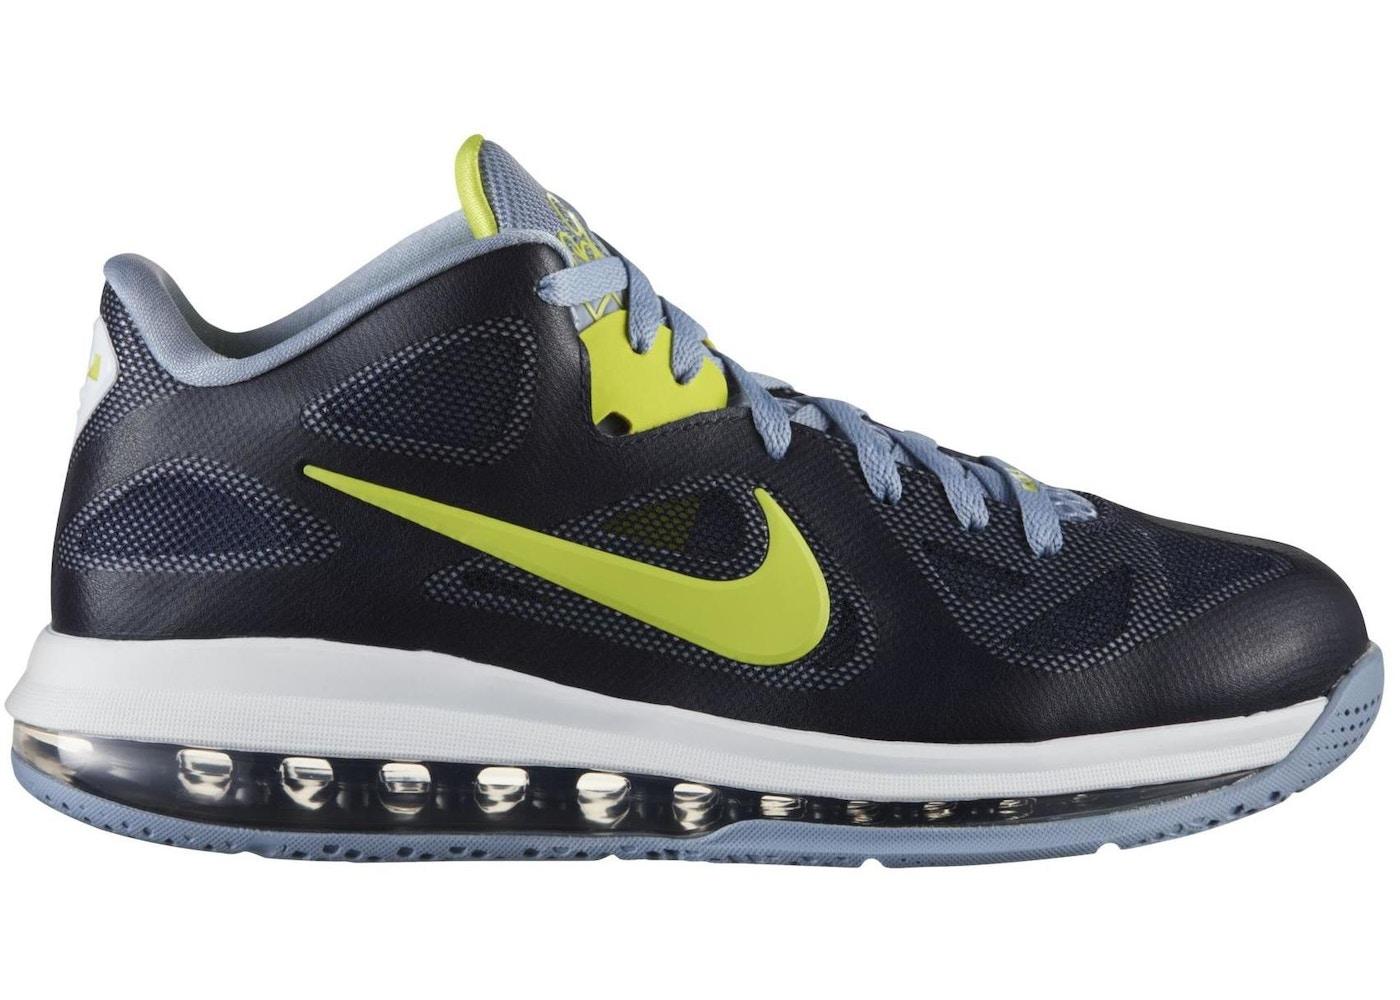 new style 744a1 b7533 Nike LeBron 9 Shoes - New Highest Bids